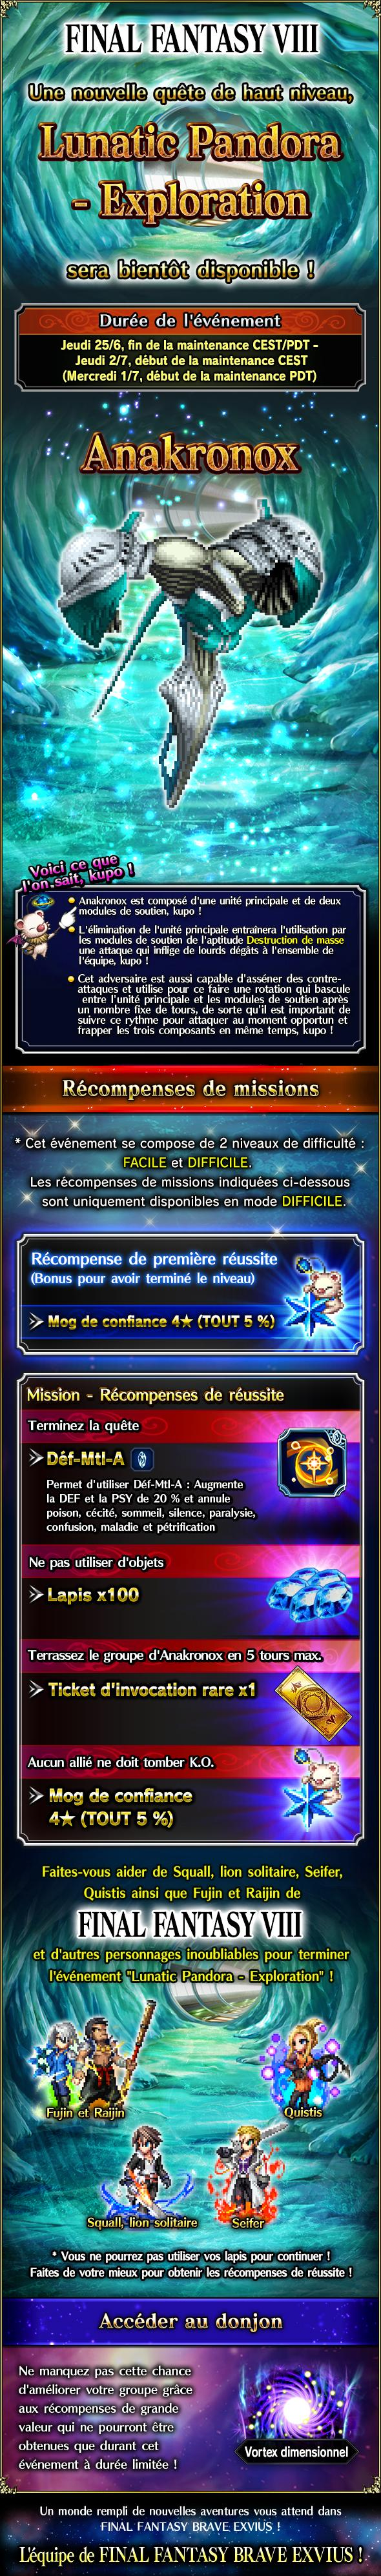 Trial MK FFVIII - Lunatic Pandora (Exploration) - du 25/06 au 02/07/20 20200623LunaticPandoraExploration